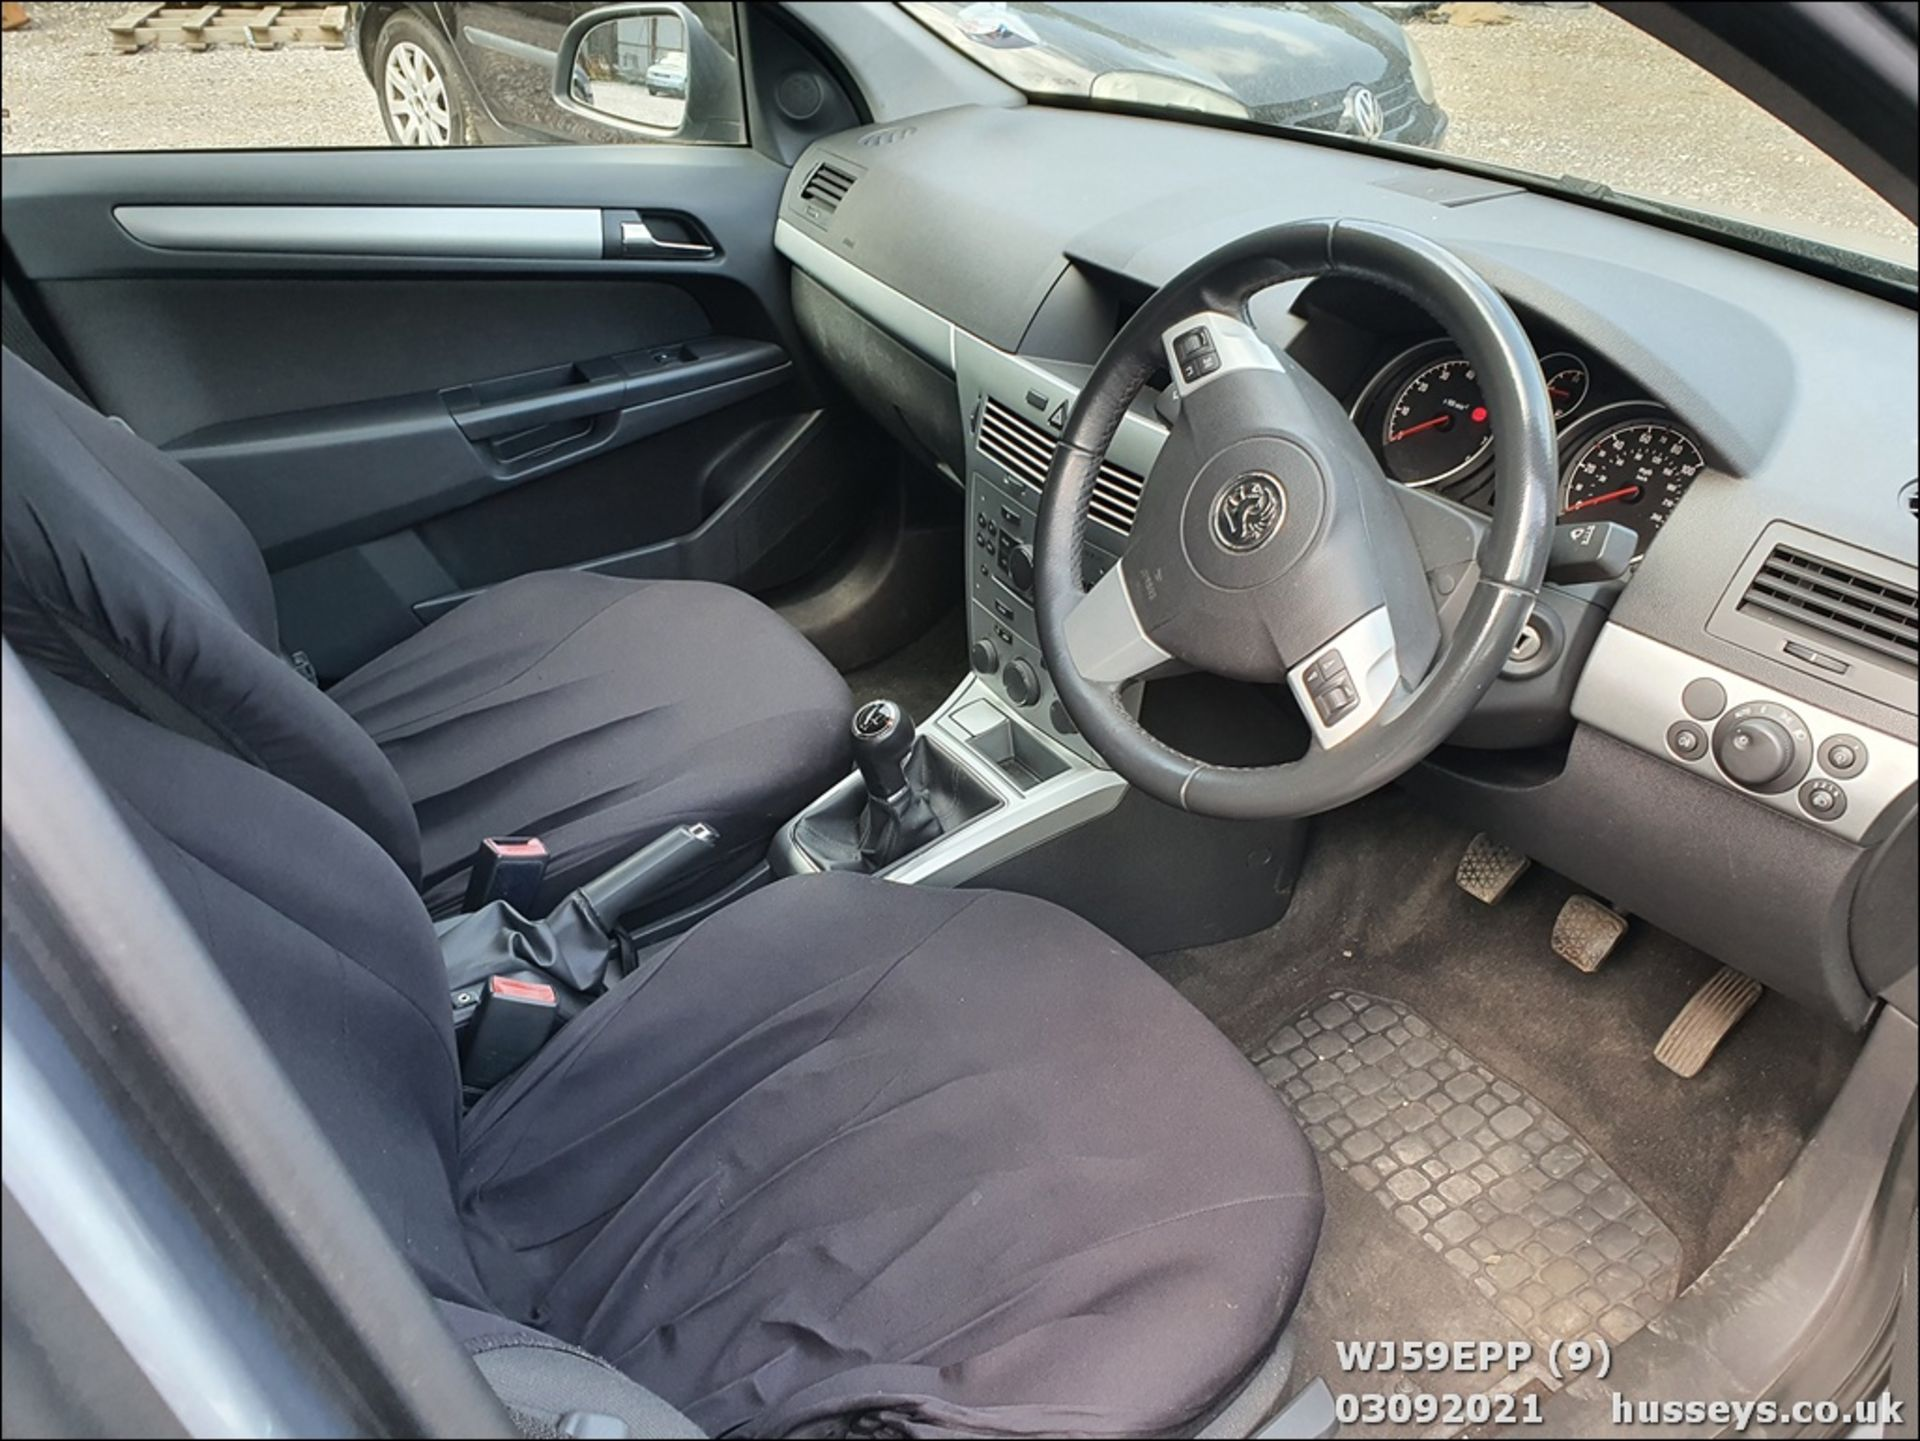 09/59 VAUXHALL ASTRA ACTIVE - 1364cc 5dr Hatchback (Silver, 101k) - Image 9 of 12